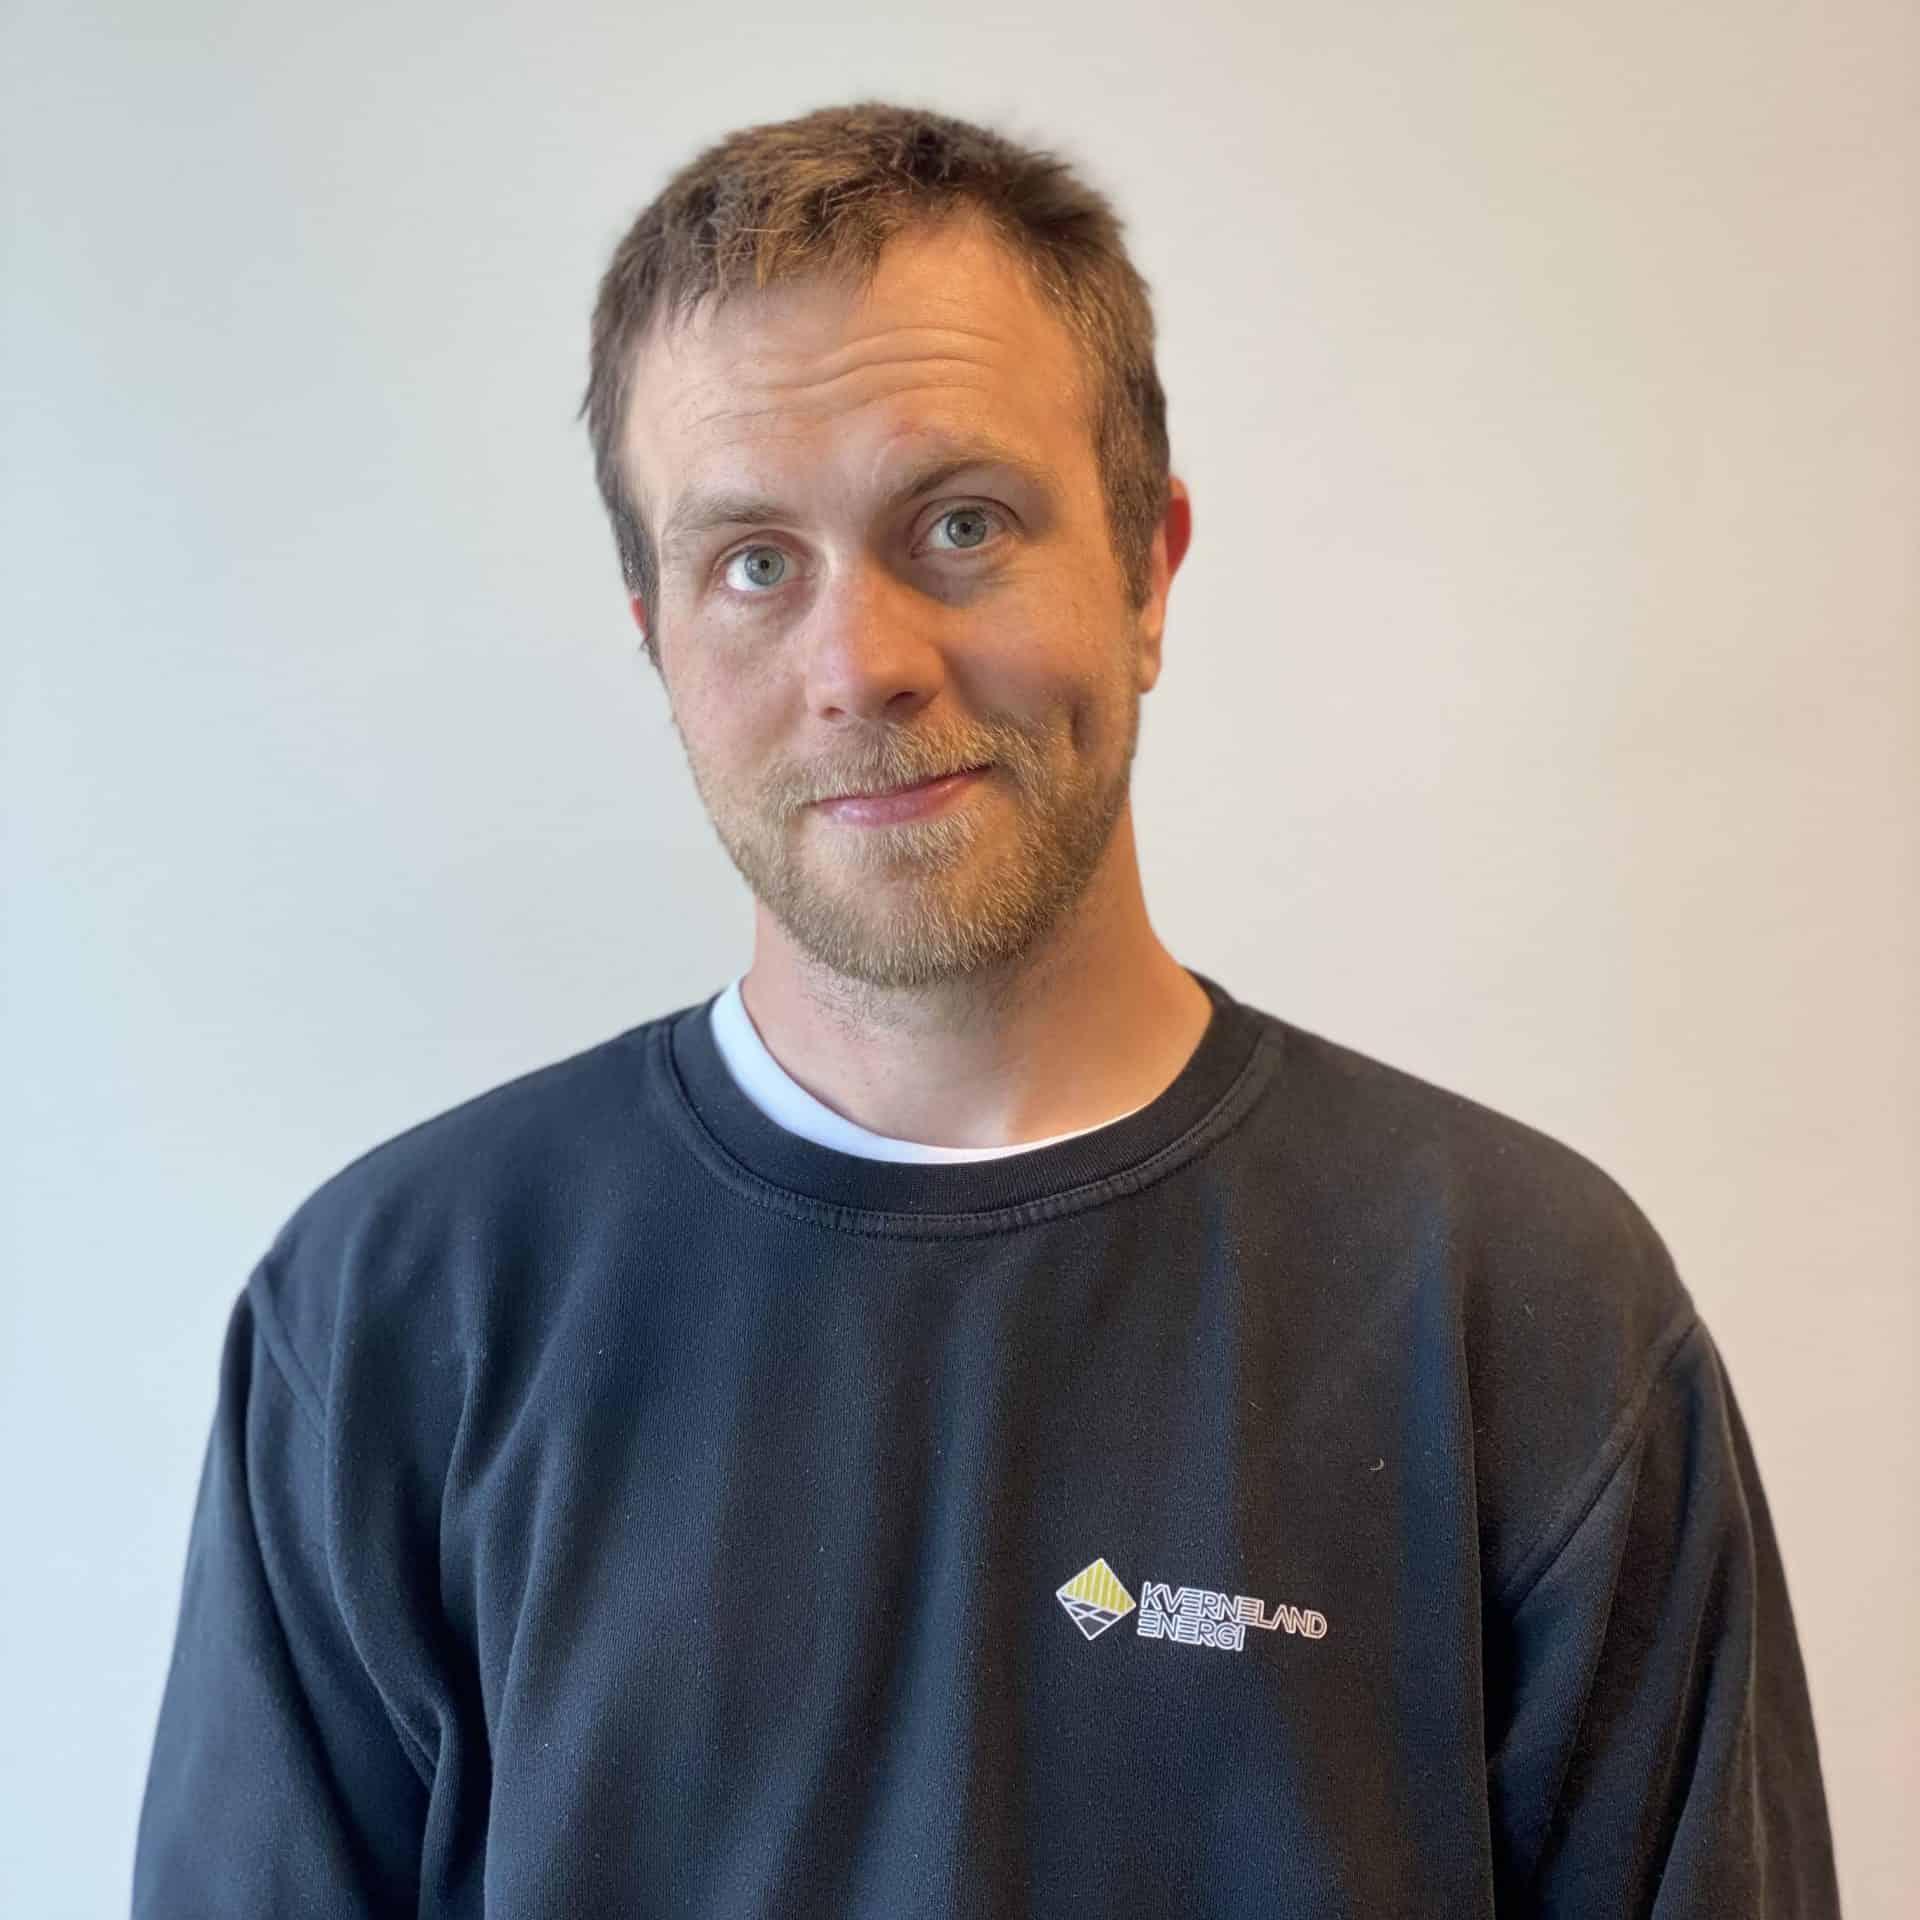 Andre Hoftun